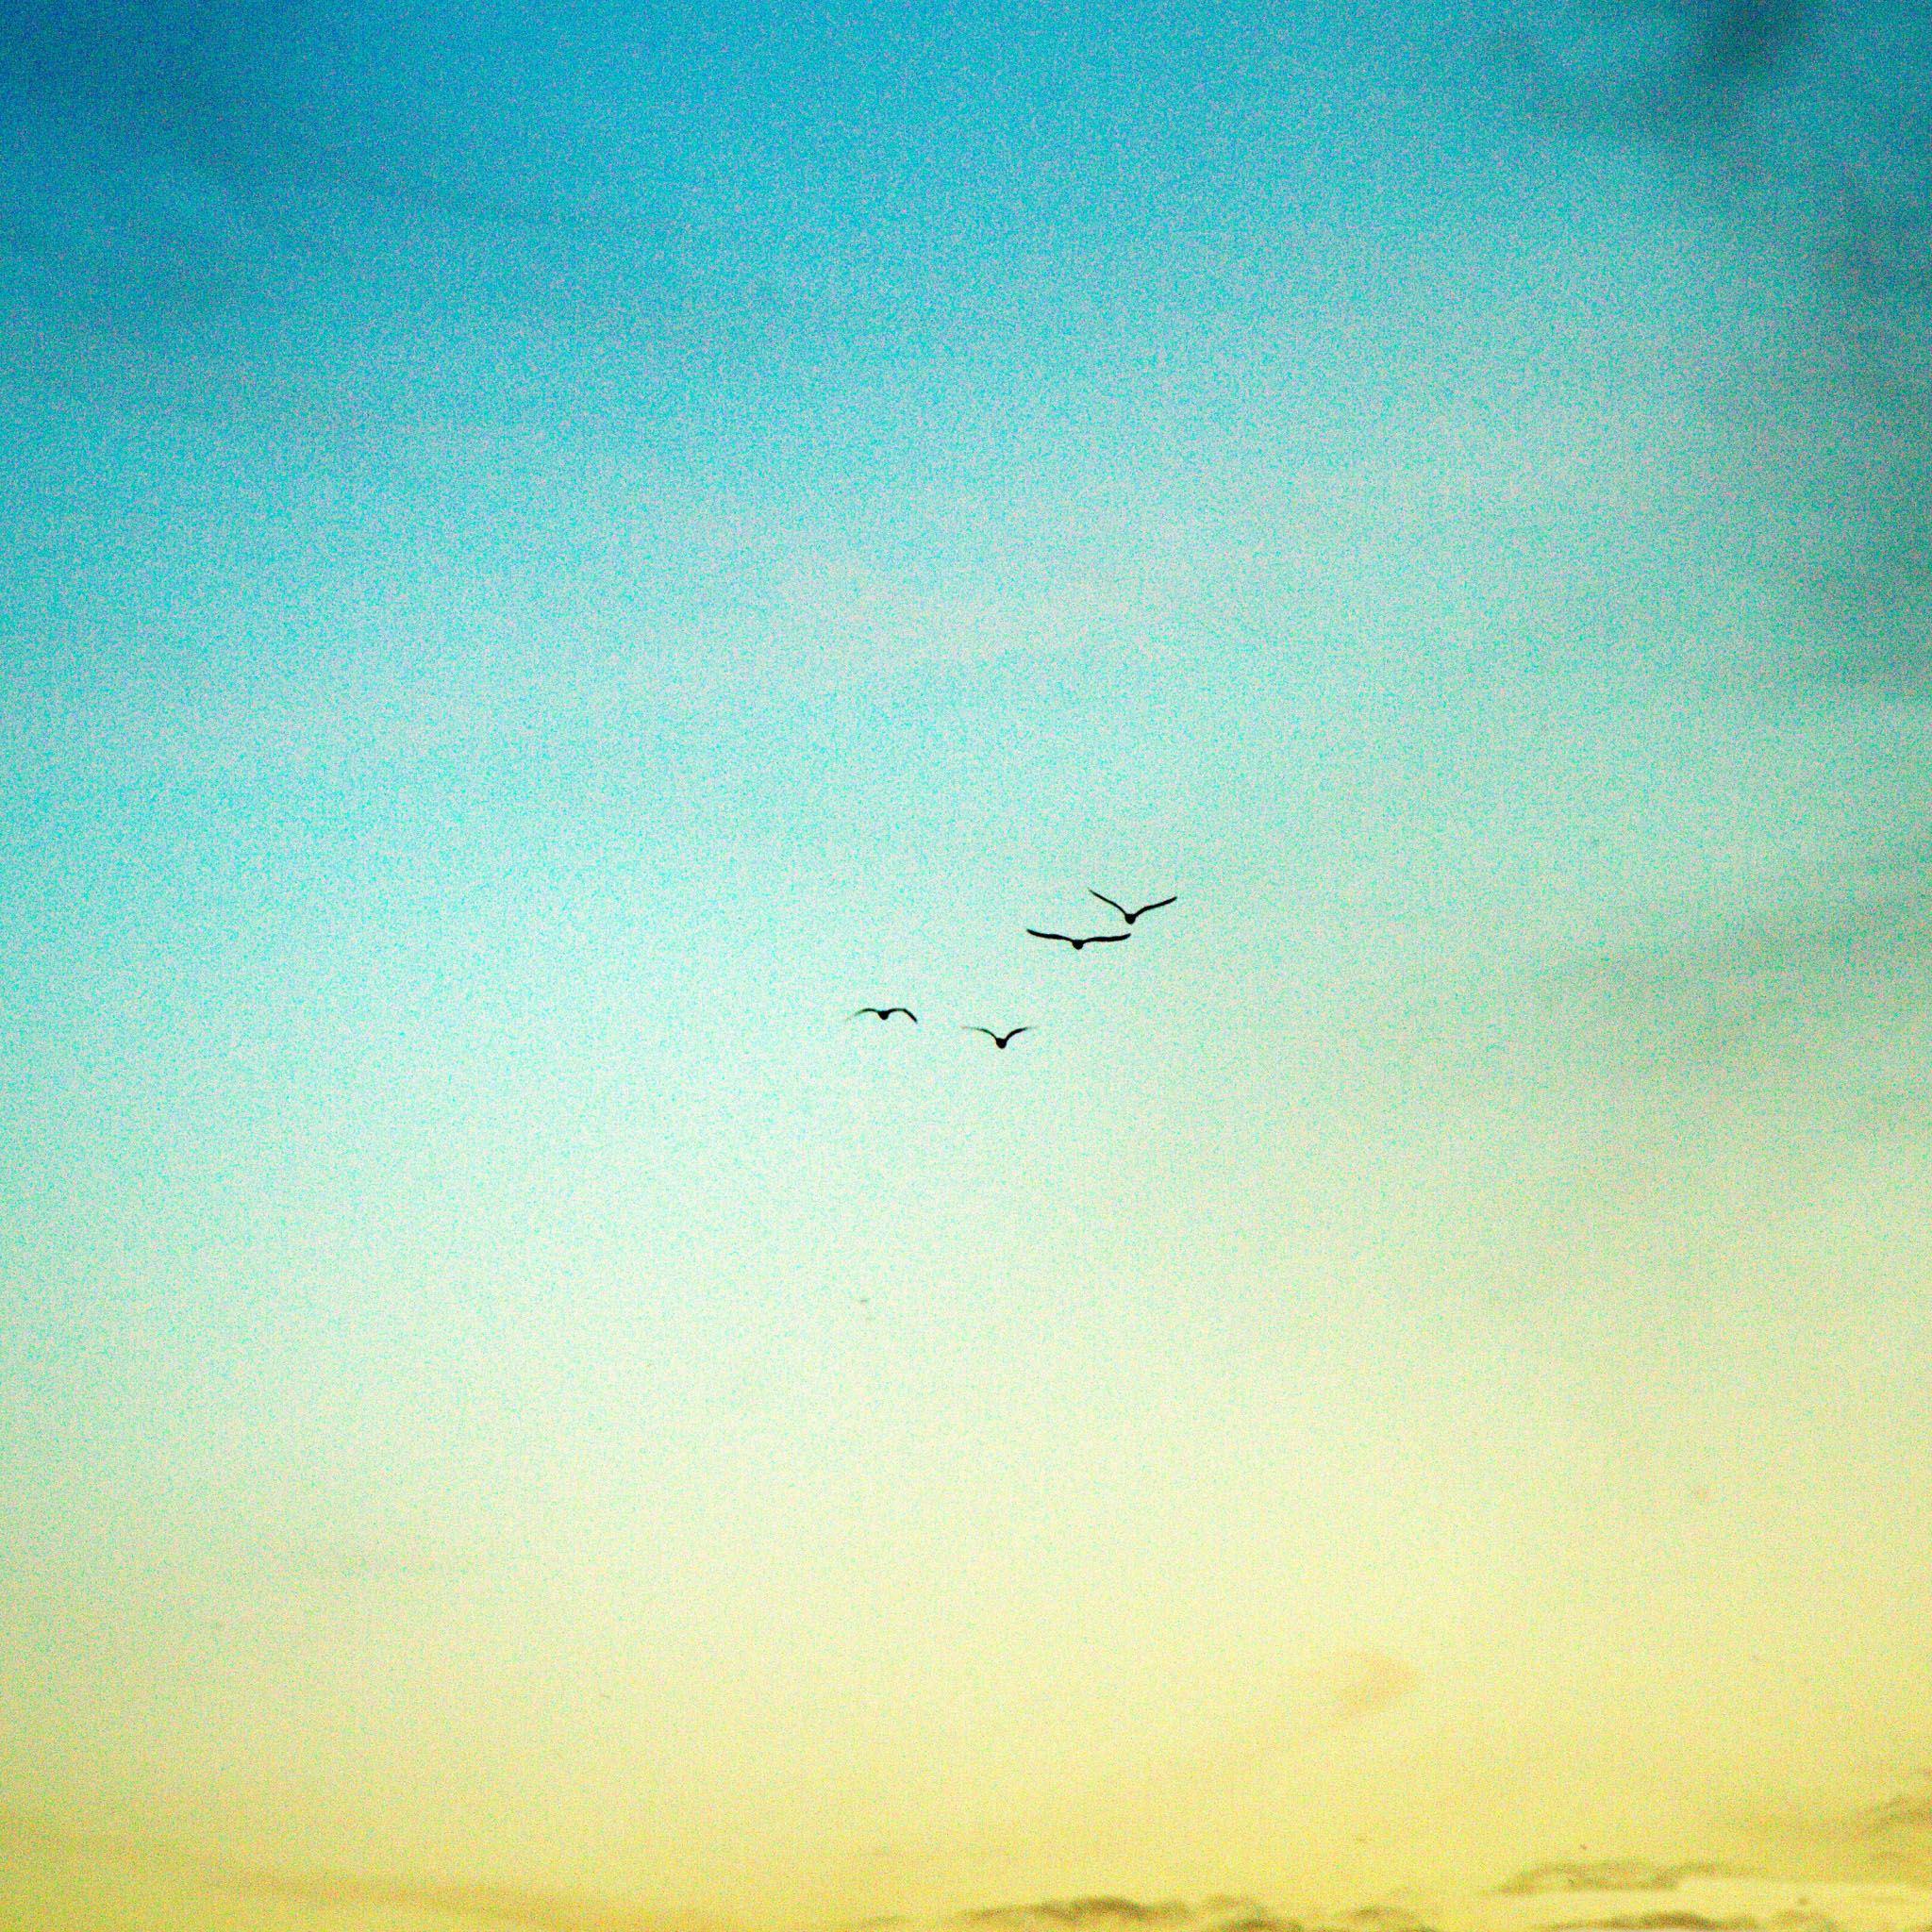 Big wild goose in the sky iPad Air wallpaper